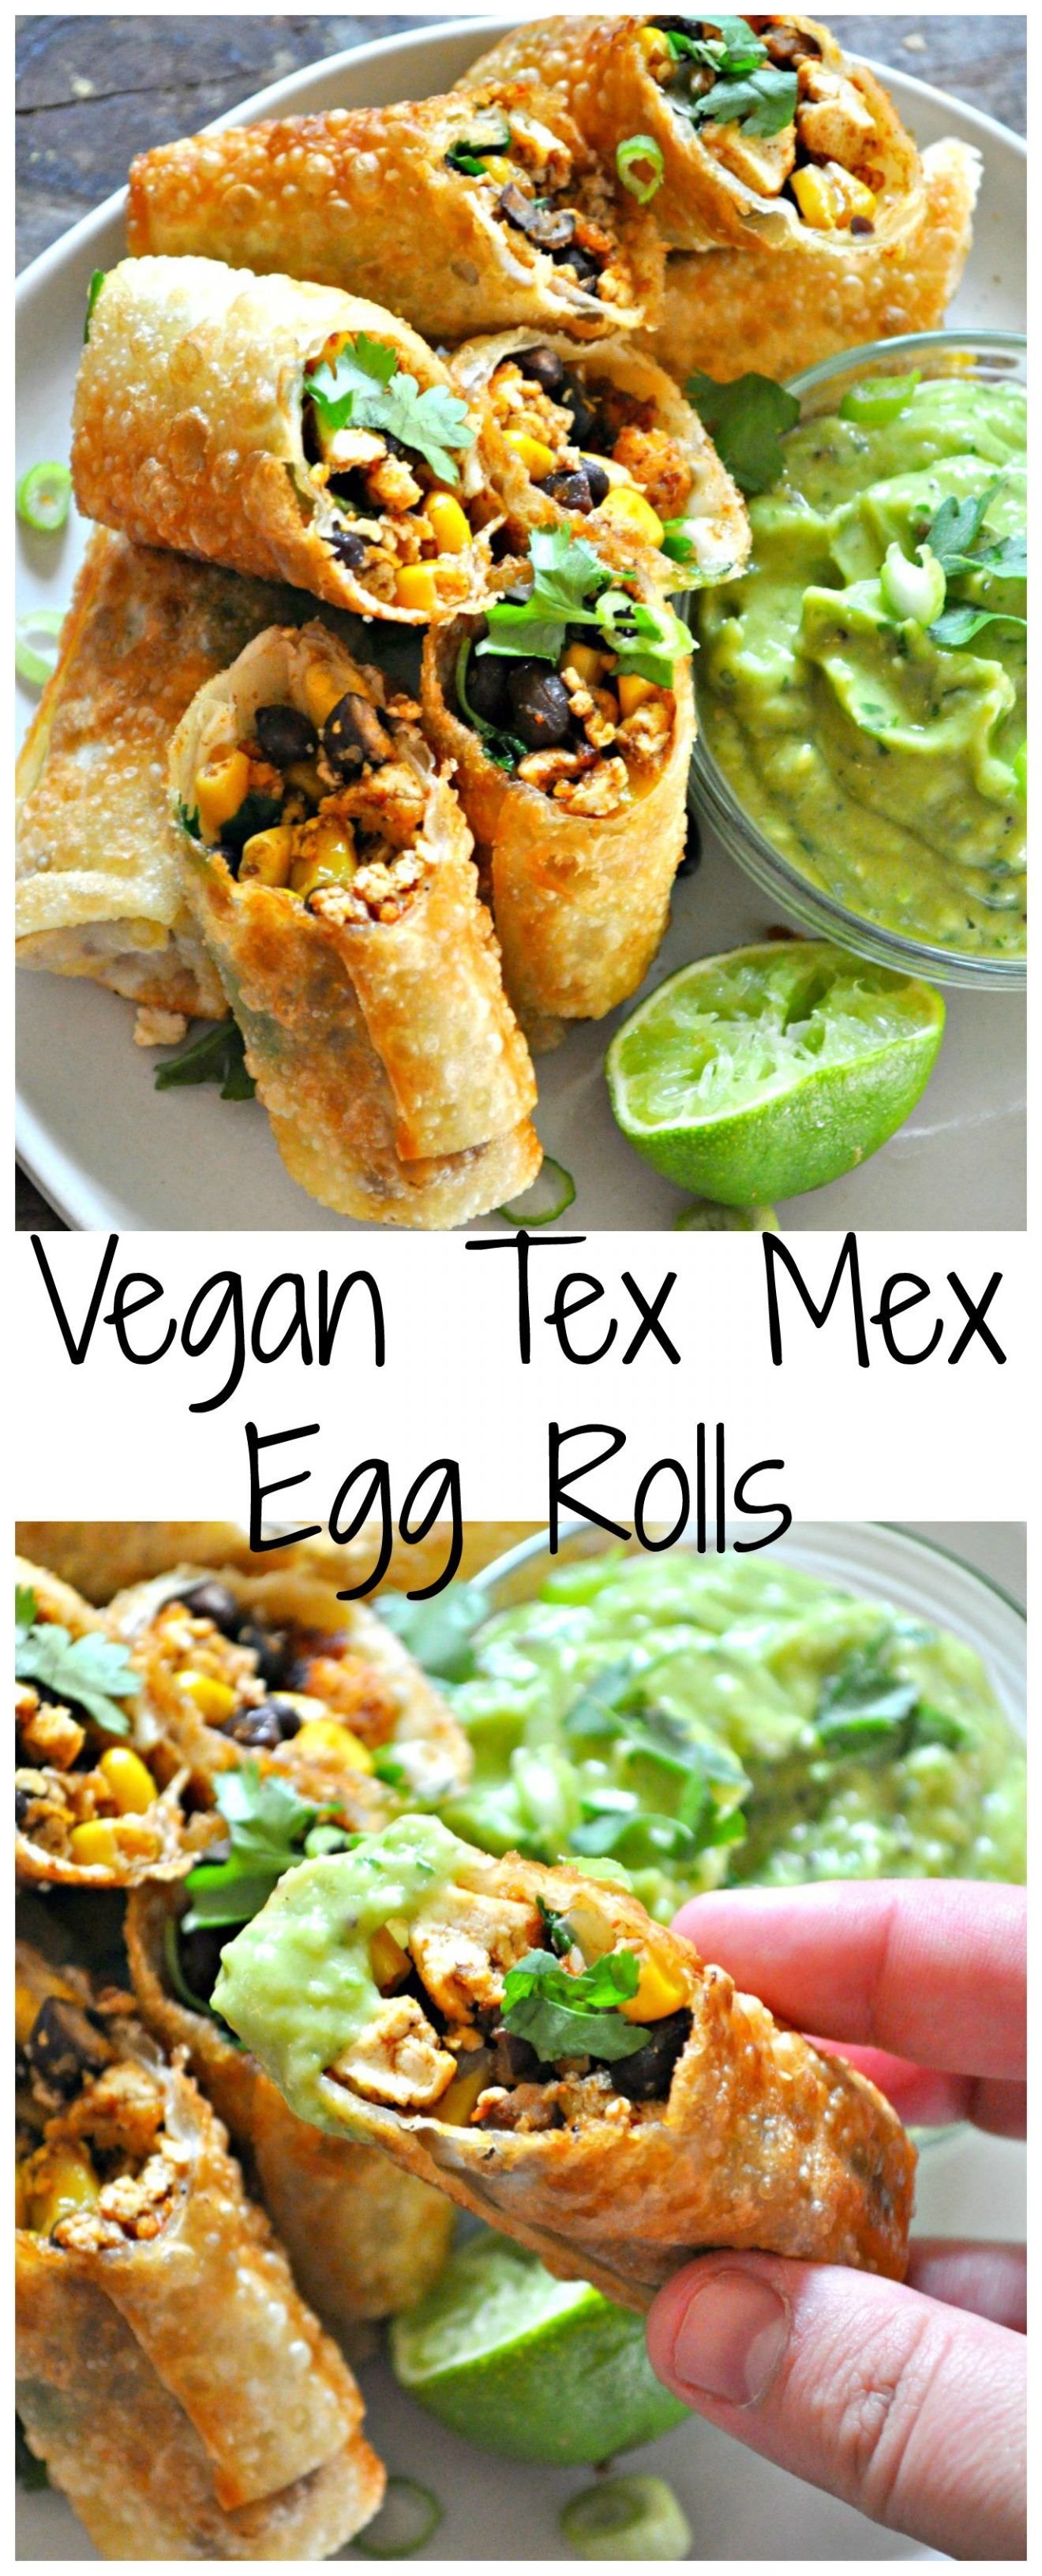 Vegan Tex Mex Egg Rolls